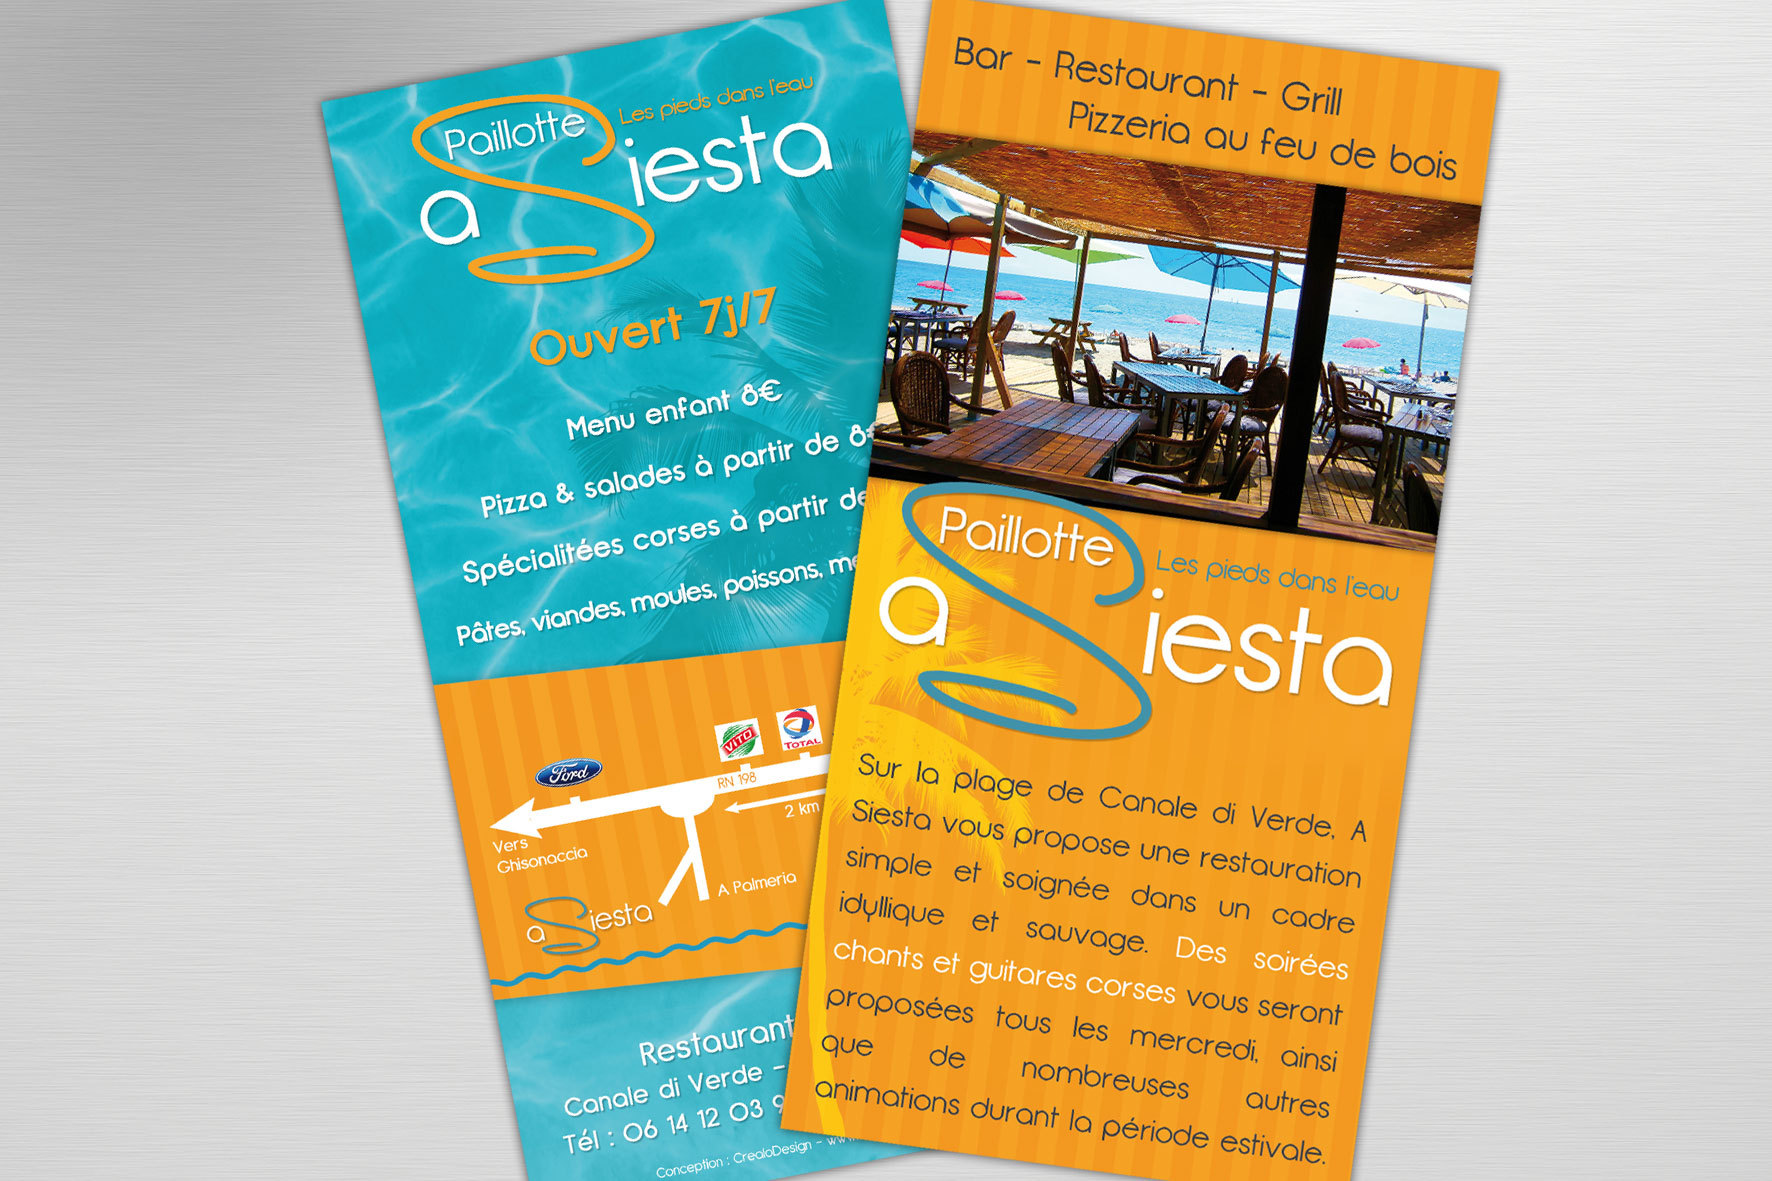 Restaurant A Siesta